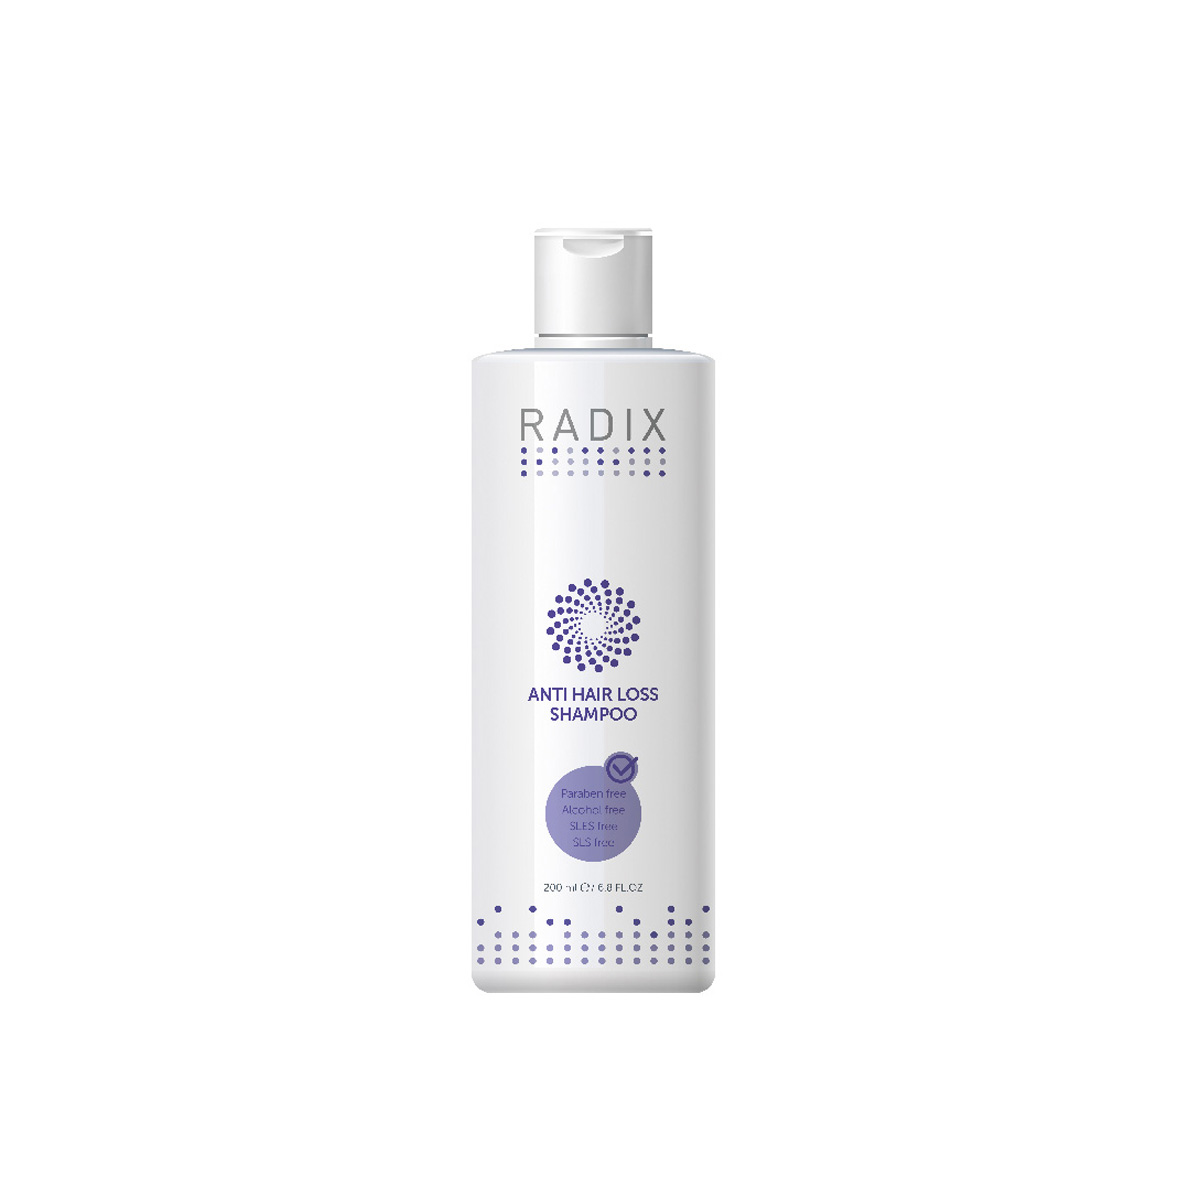 Radix Saç Dökülmesine Karşı Etkili Şampuan